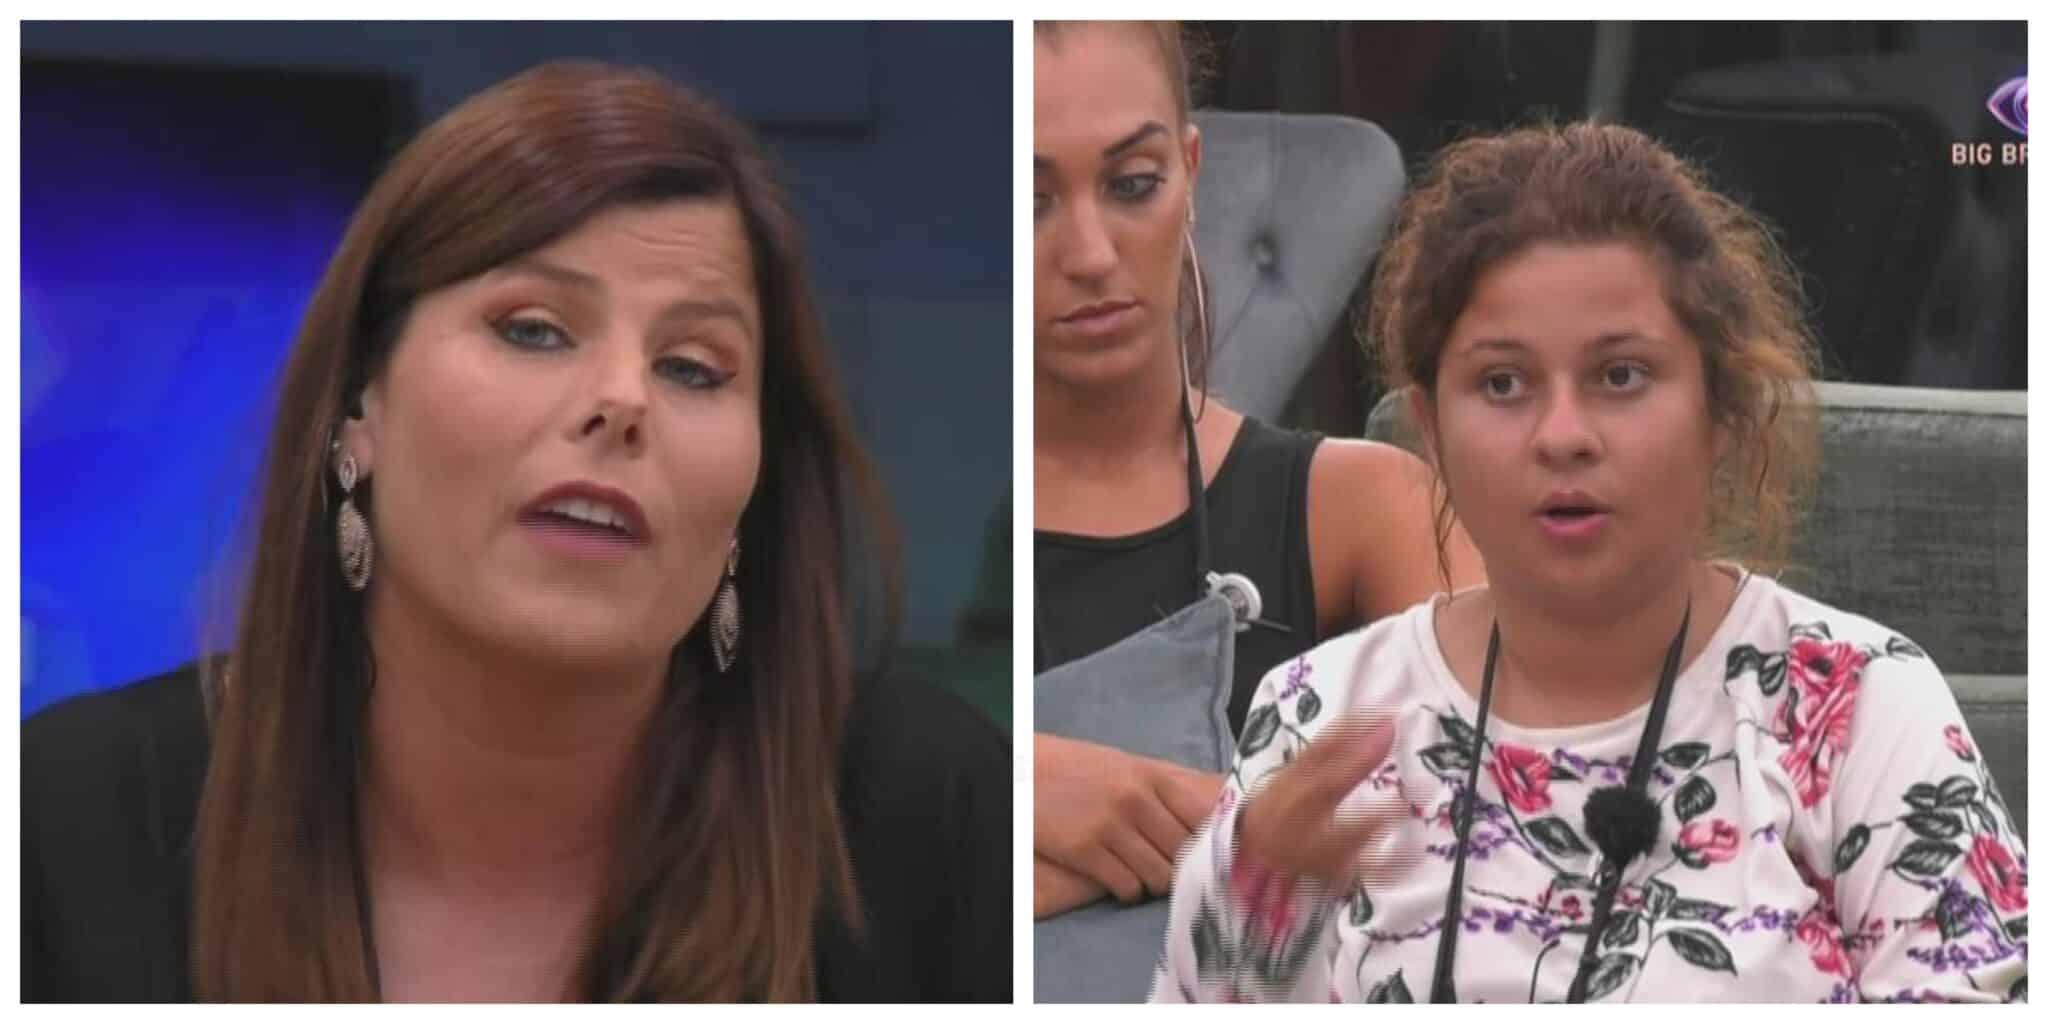 Big-Brother-Noelia-Sandrina